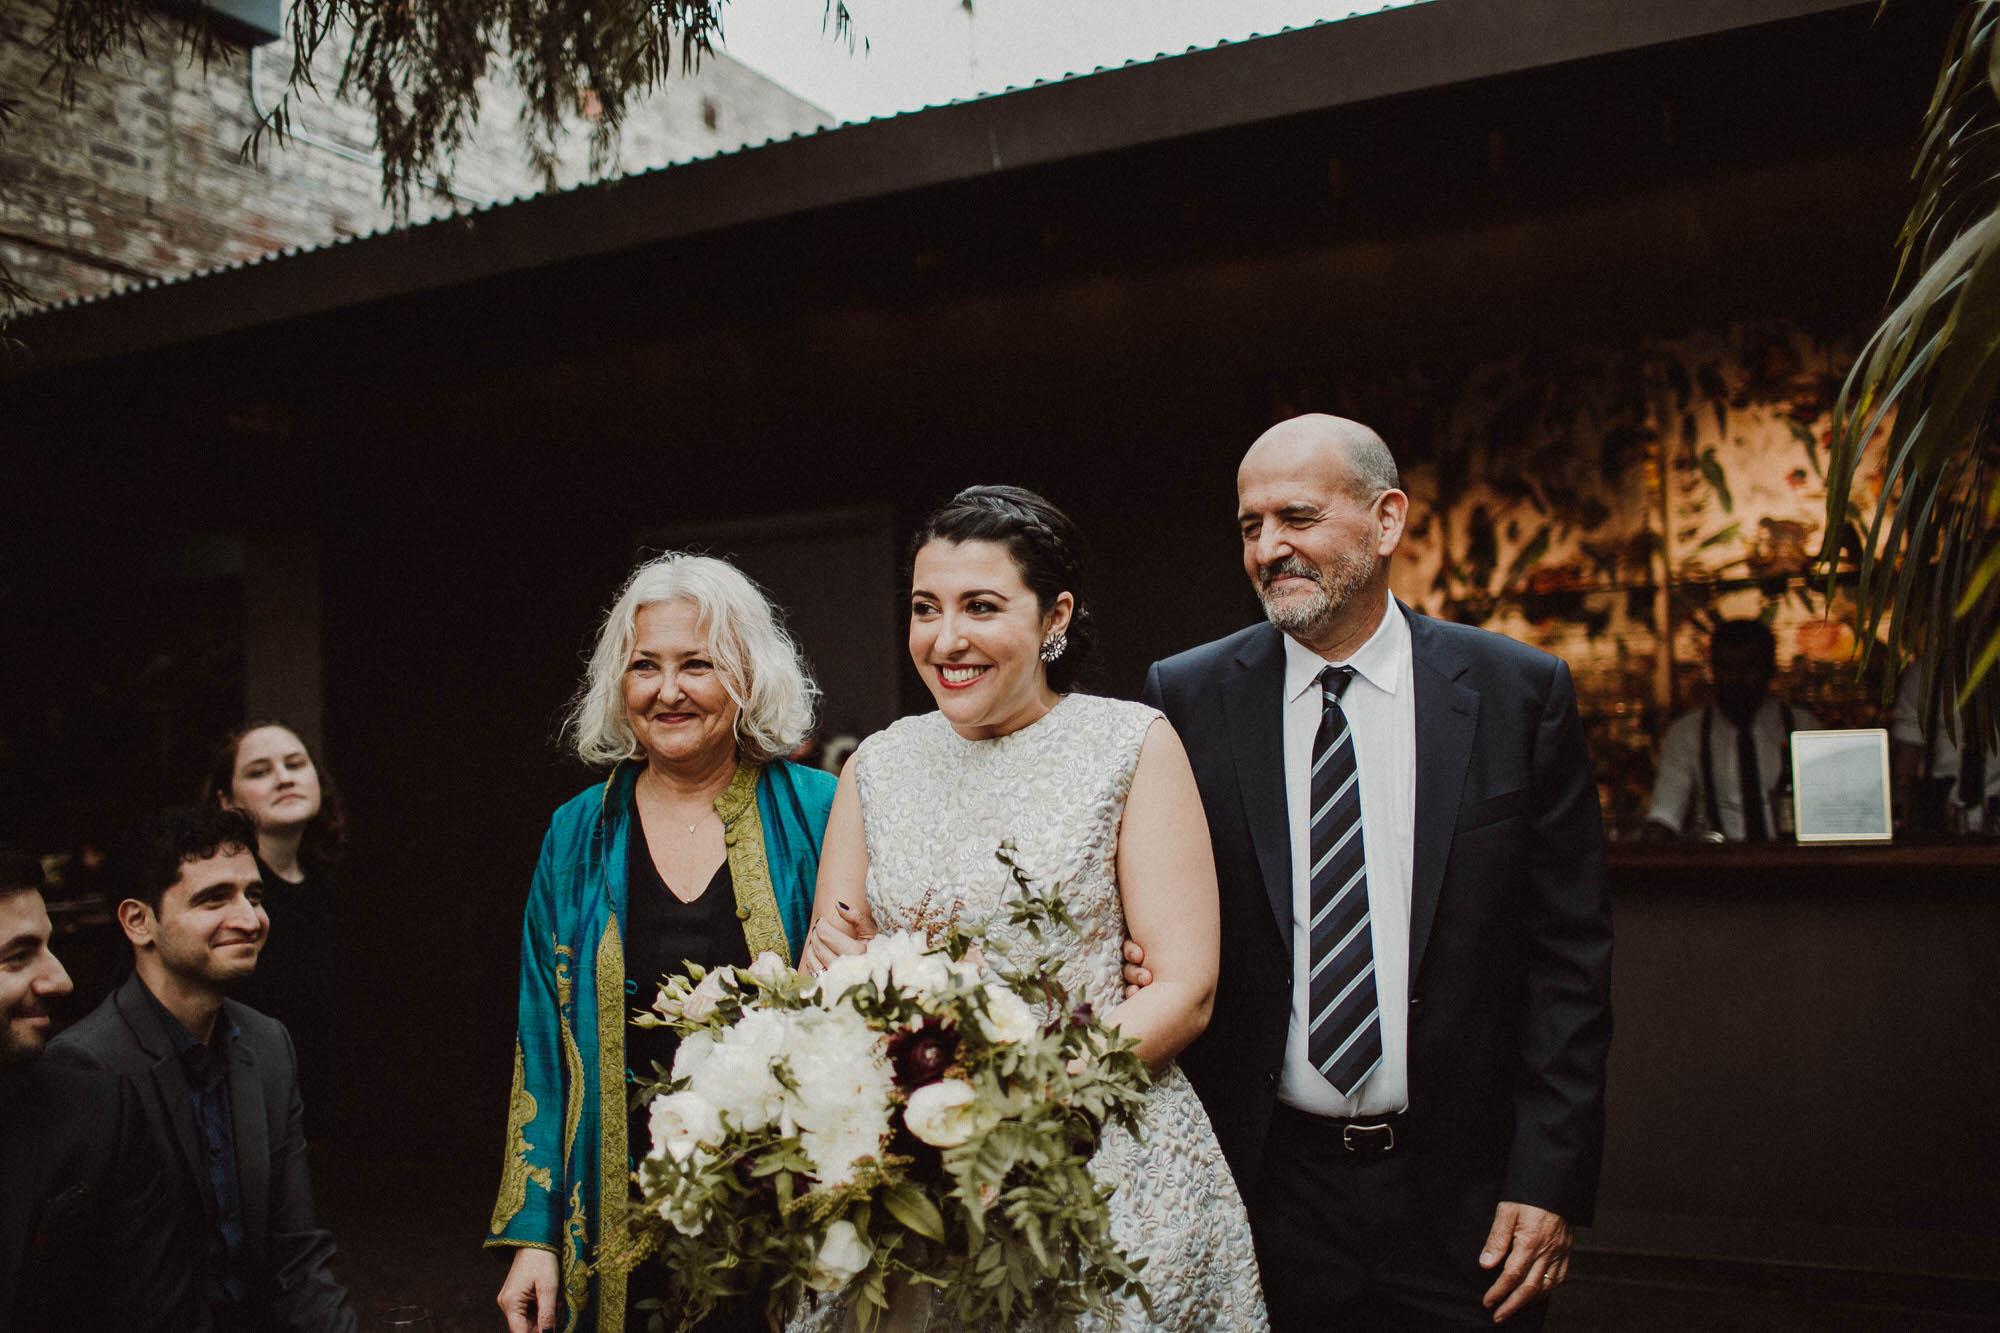 los-angeles-wedding-photographer-millwick-101.jpg